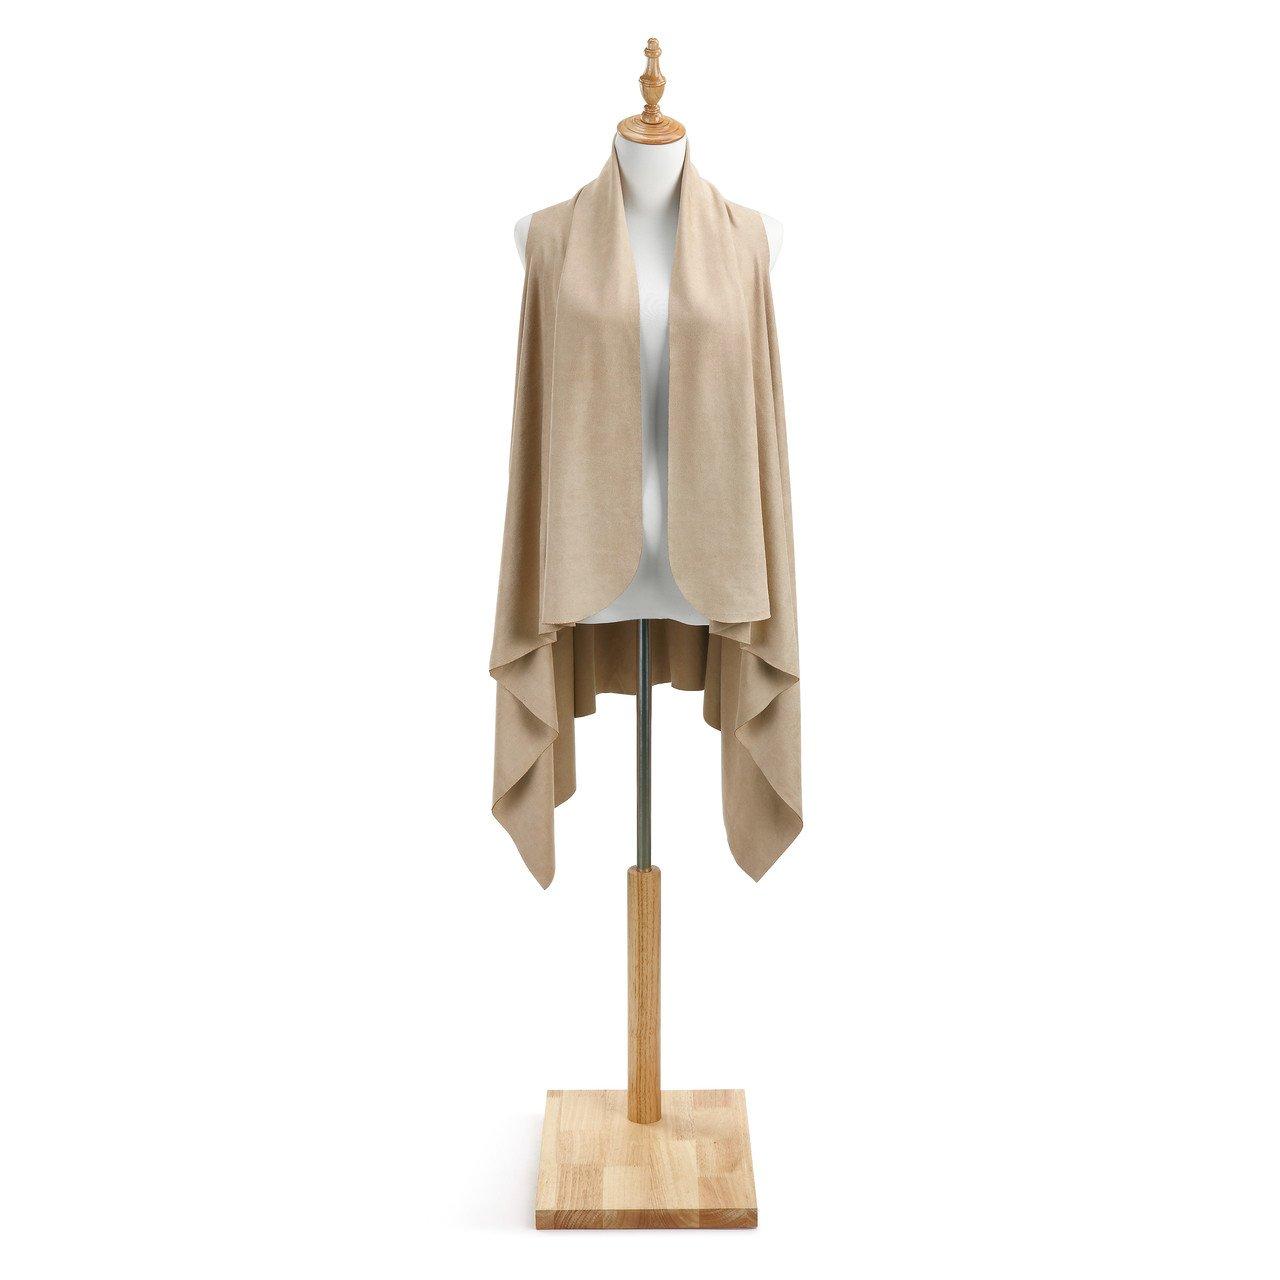 Tan Women's One Size Vegan Suede Fashion Vest Duster